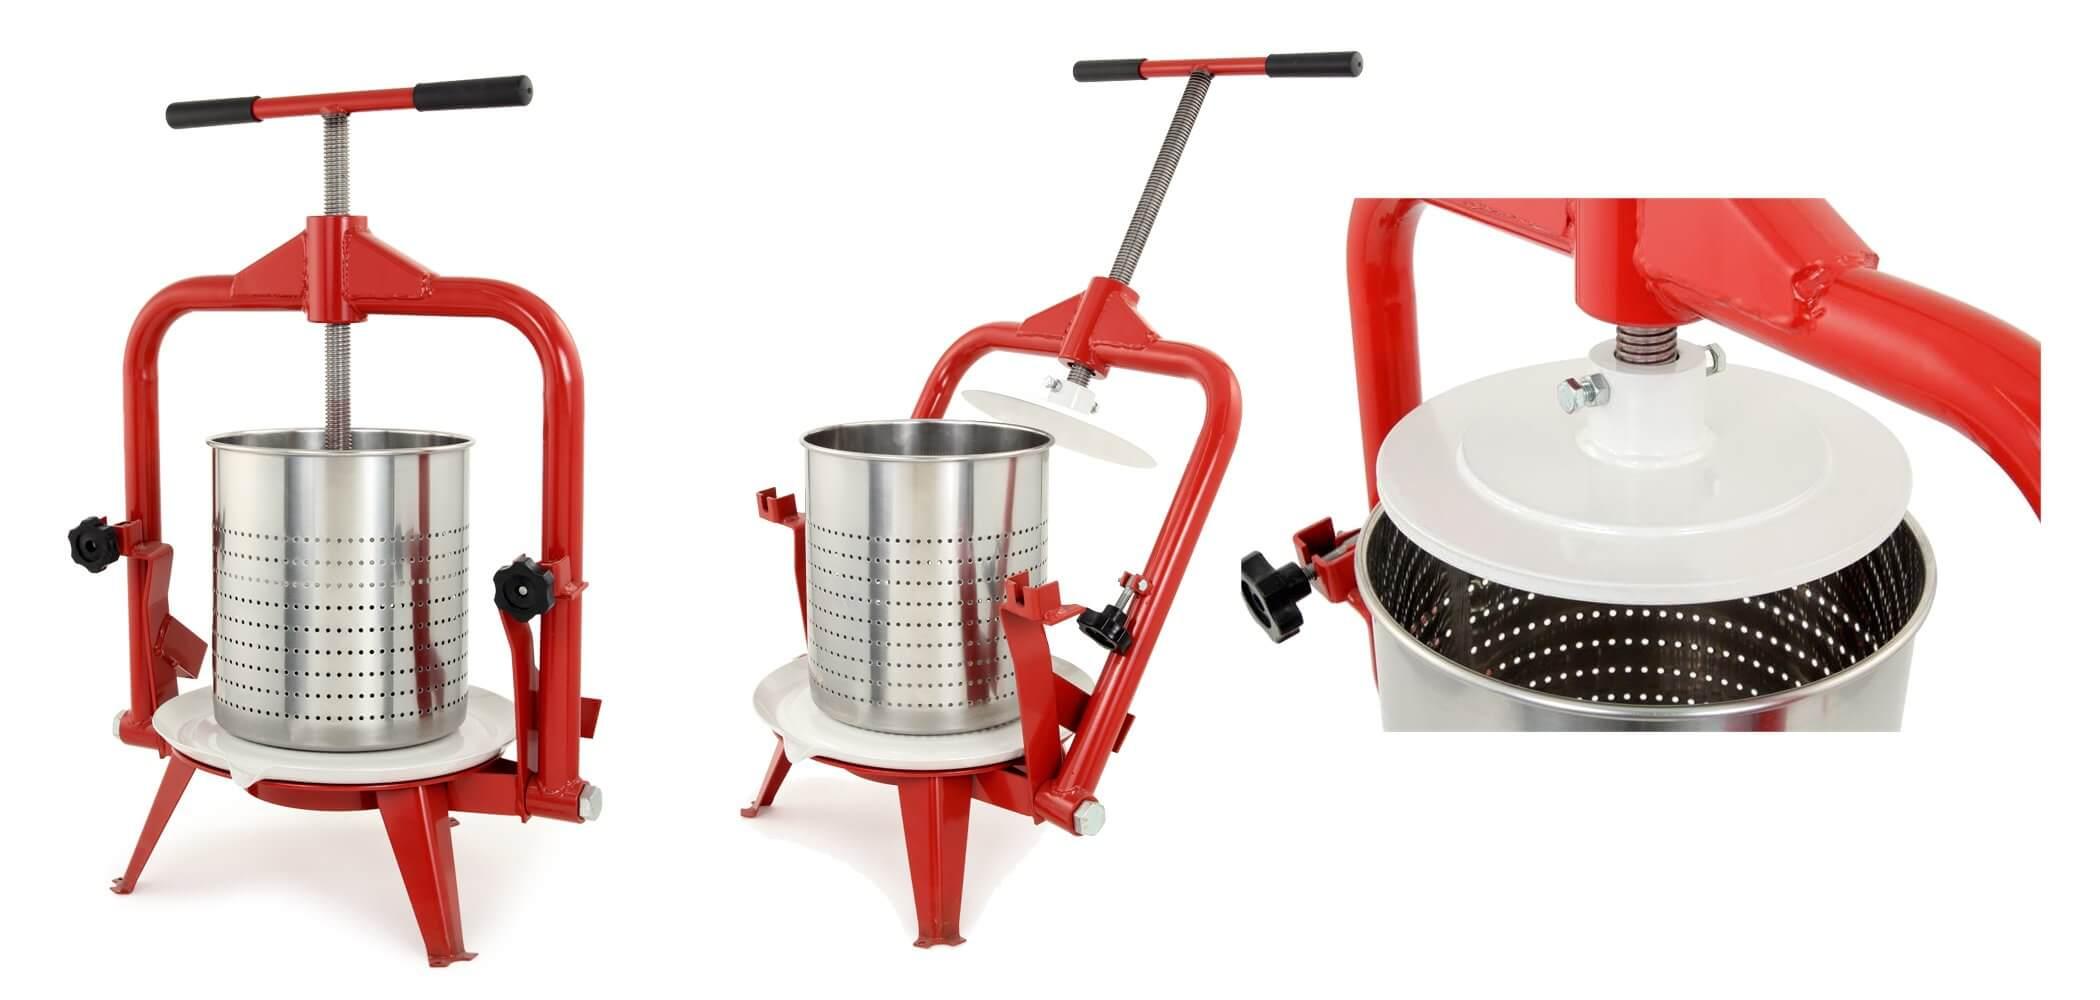 harvest deluxe stainless steel fruit press from tsm 14l 31162 homesteader 39 s supply. Black Bedroom Furniture Sets. Home Design Ideas